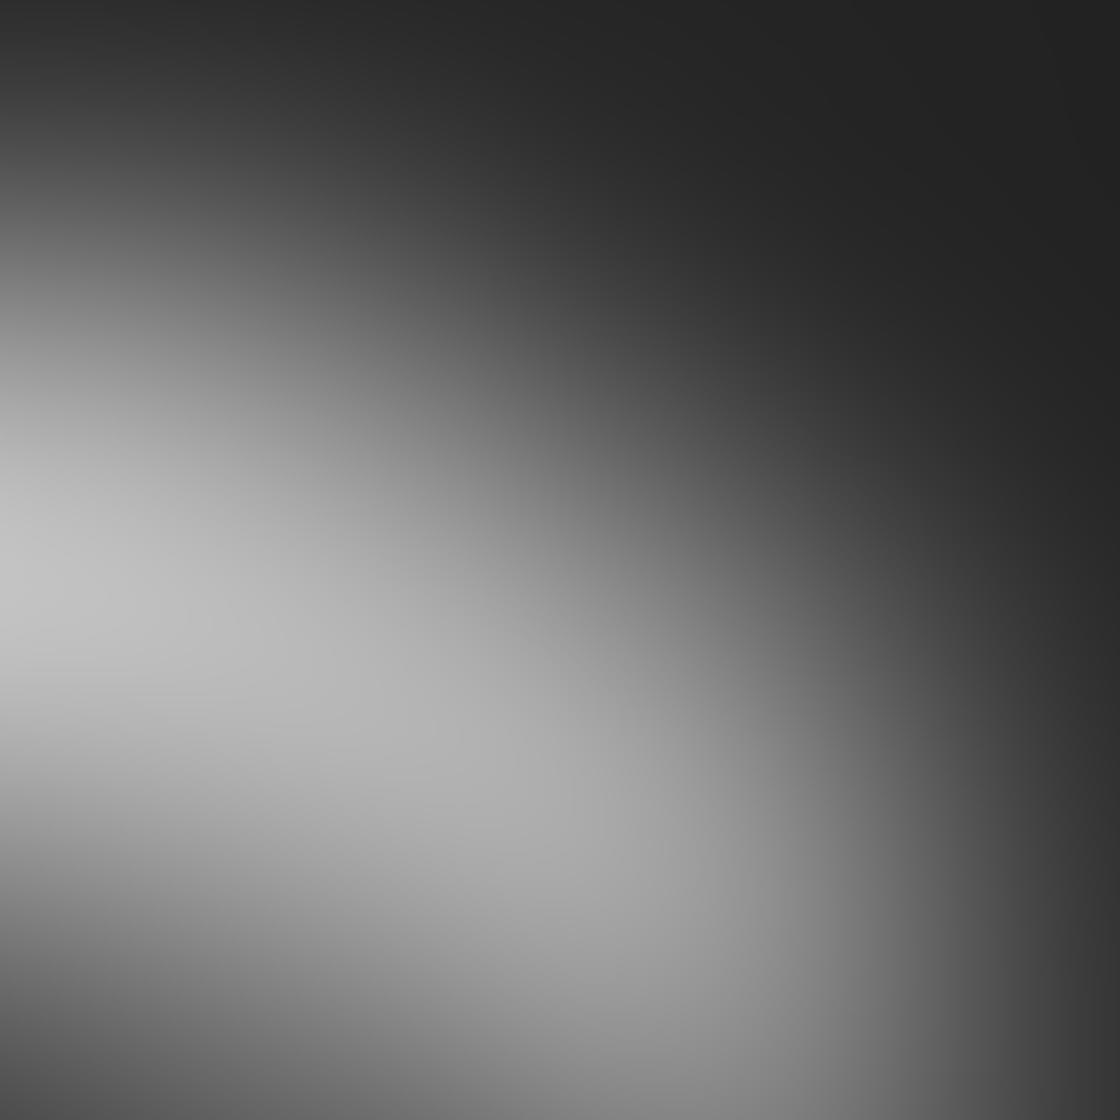 iPhone Photo Shadows 30